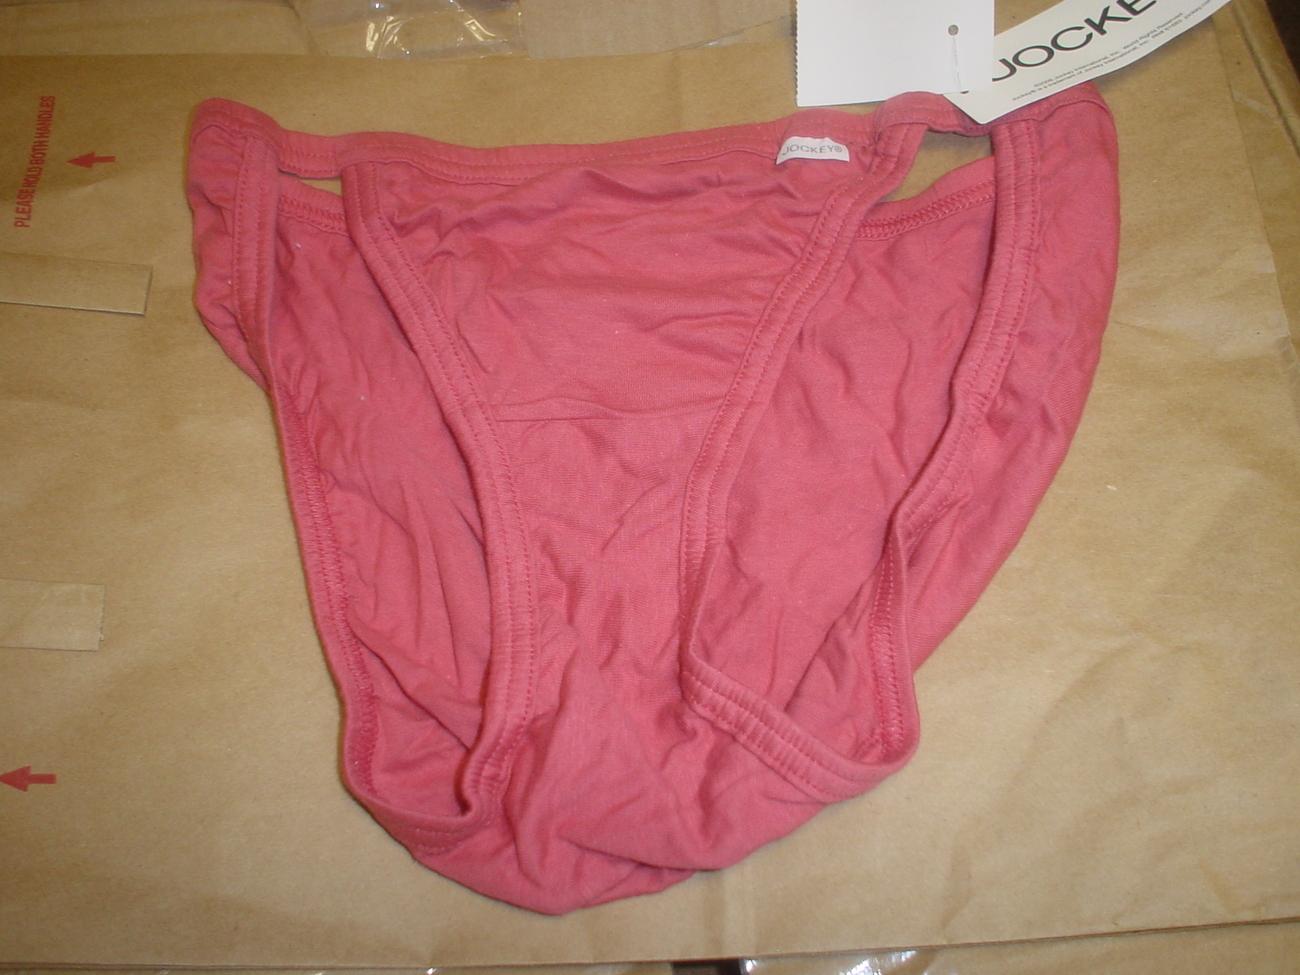 Jockey Cotton String Bikini 5/Small Rust SP-Slightly Imperfect NWOT